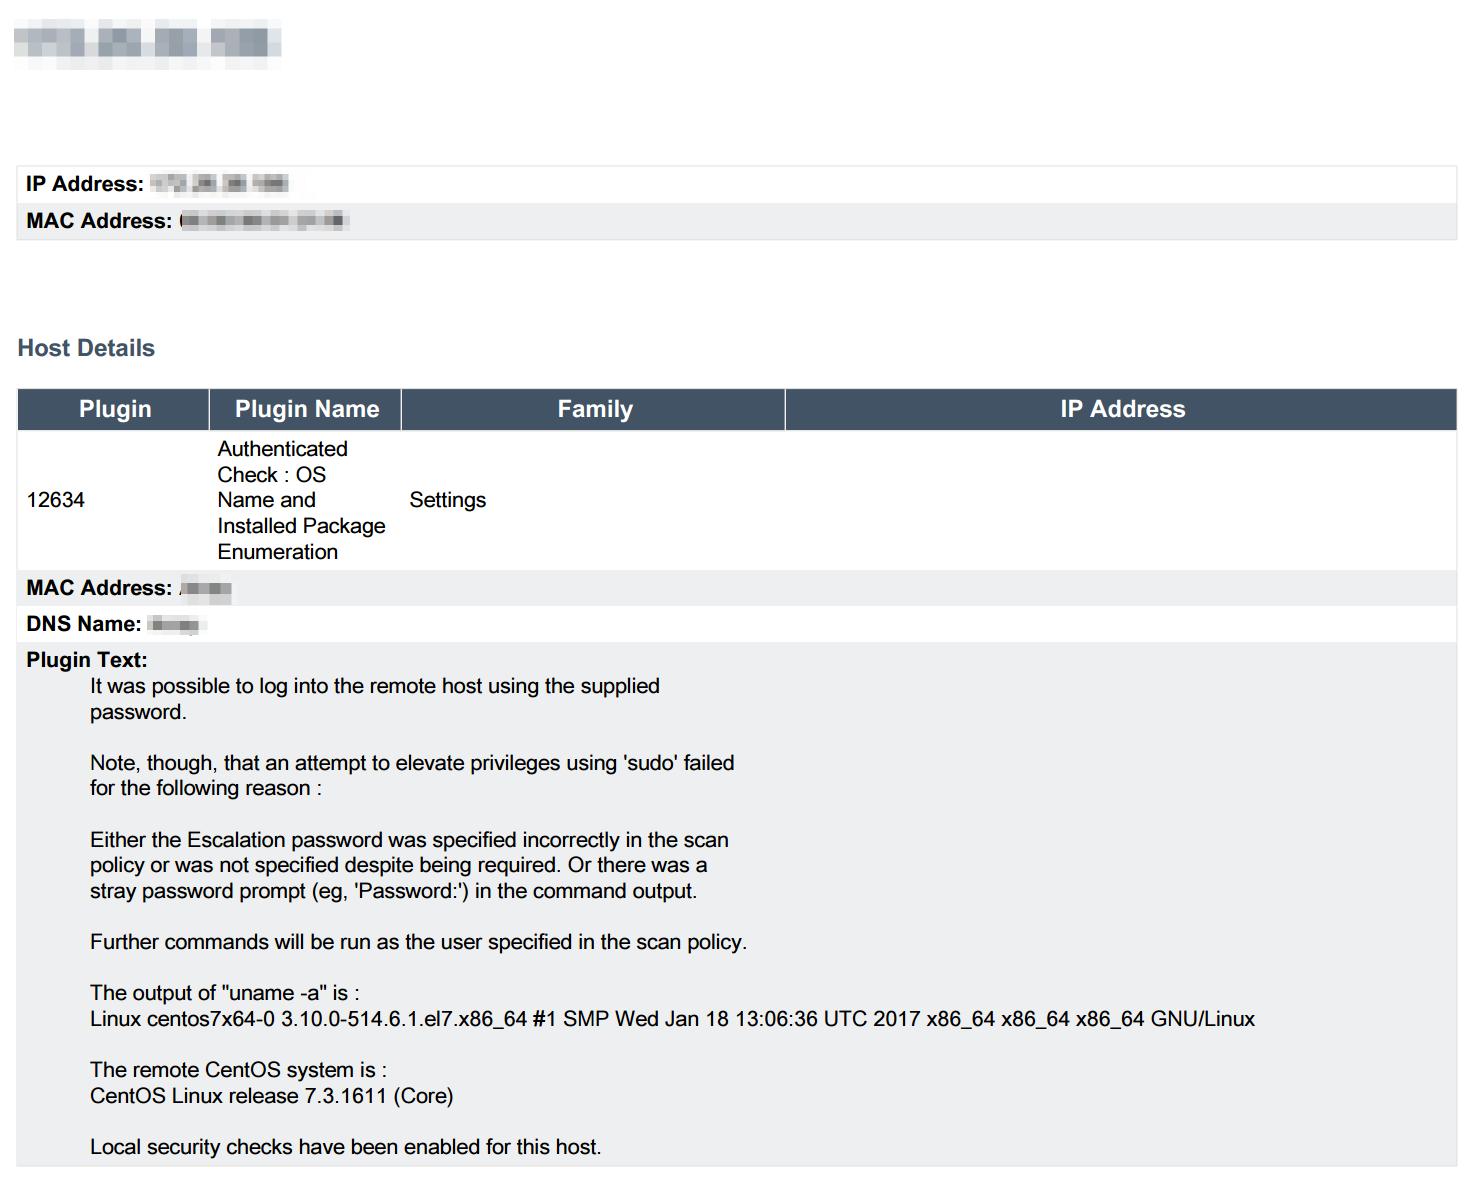 Elevated Privilege Failures report IP detail